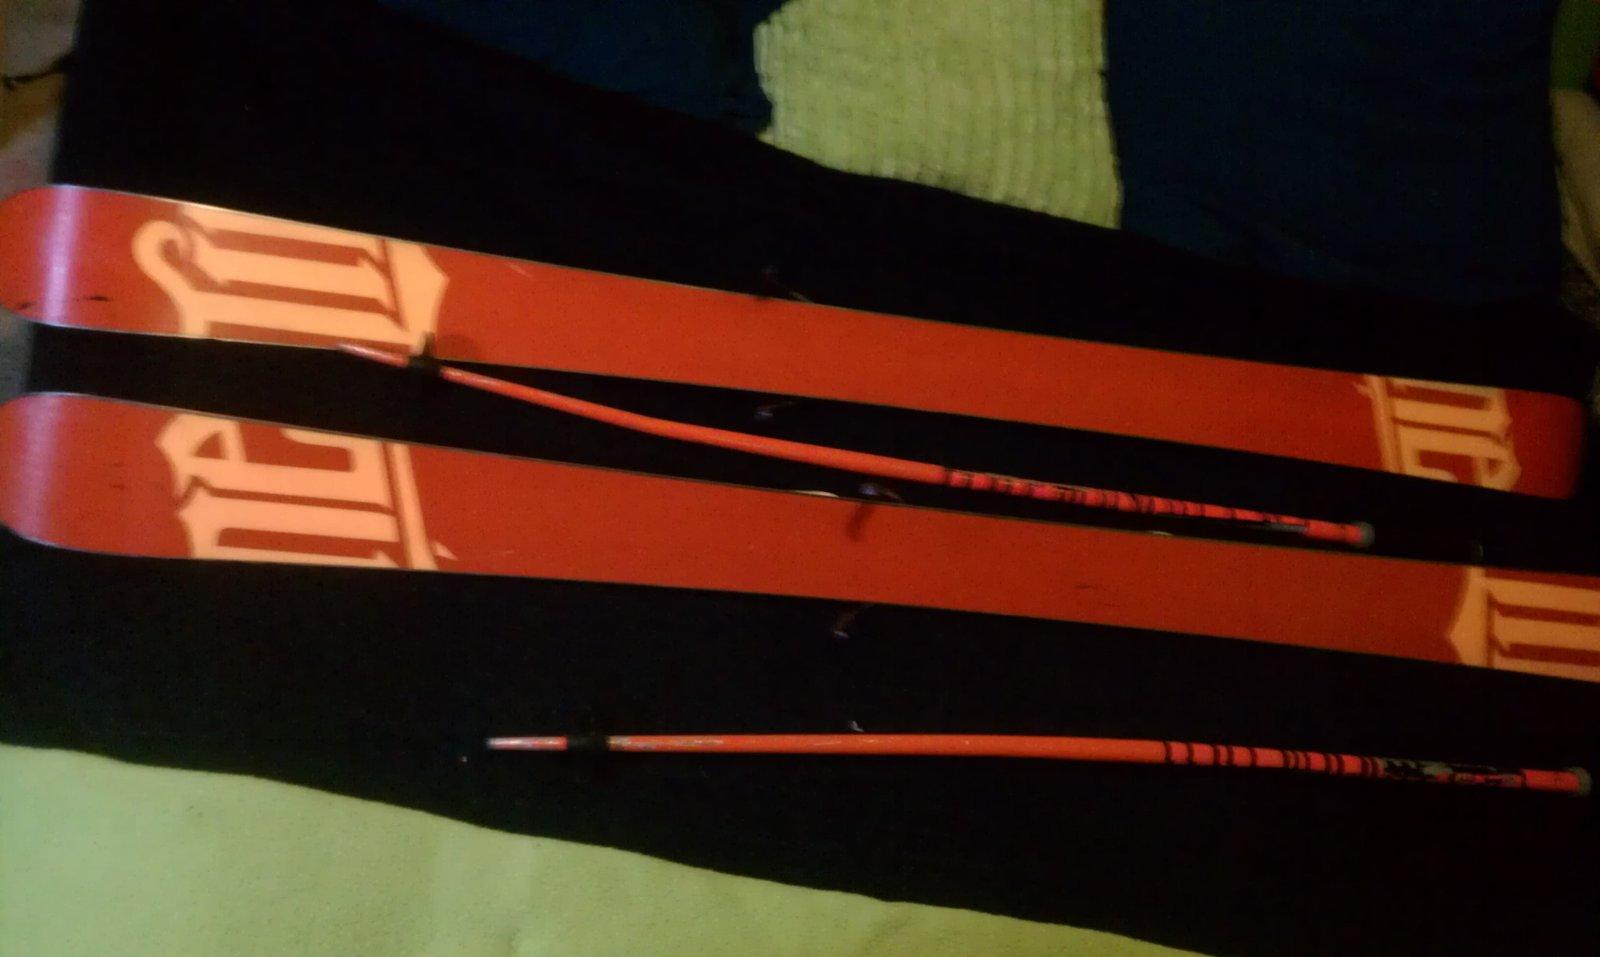 my line park skiis